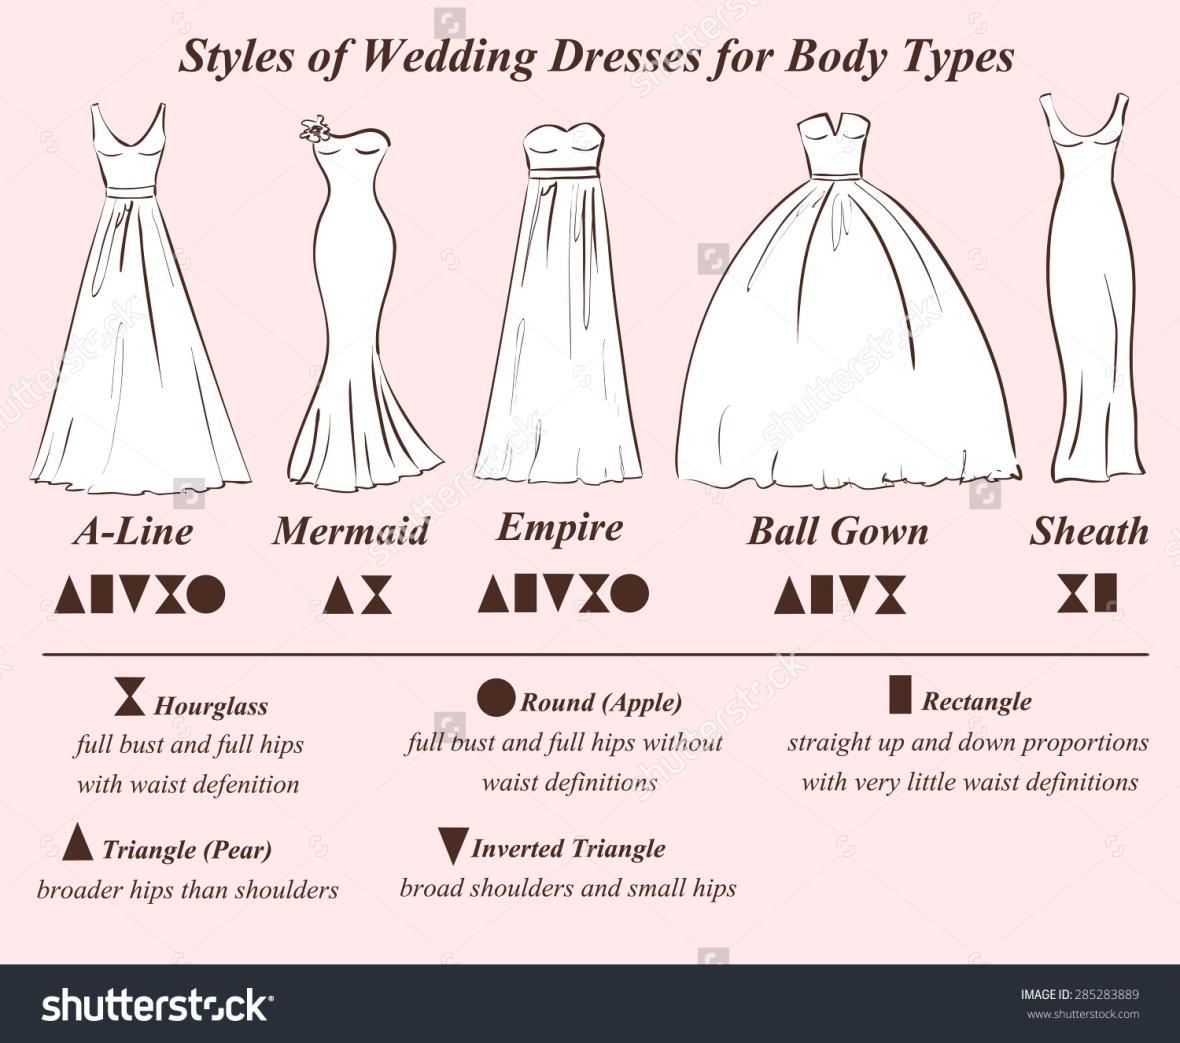 stock-vector-set-of-wedding-dress-styles-for-female-body-shape-types-wedding-dress-infographic-285283889